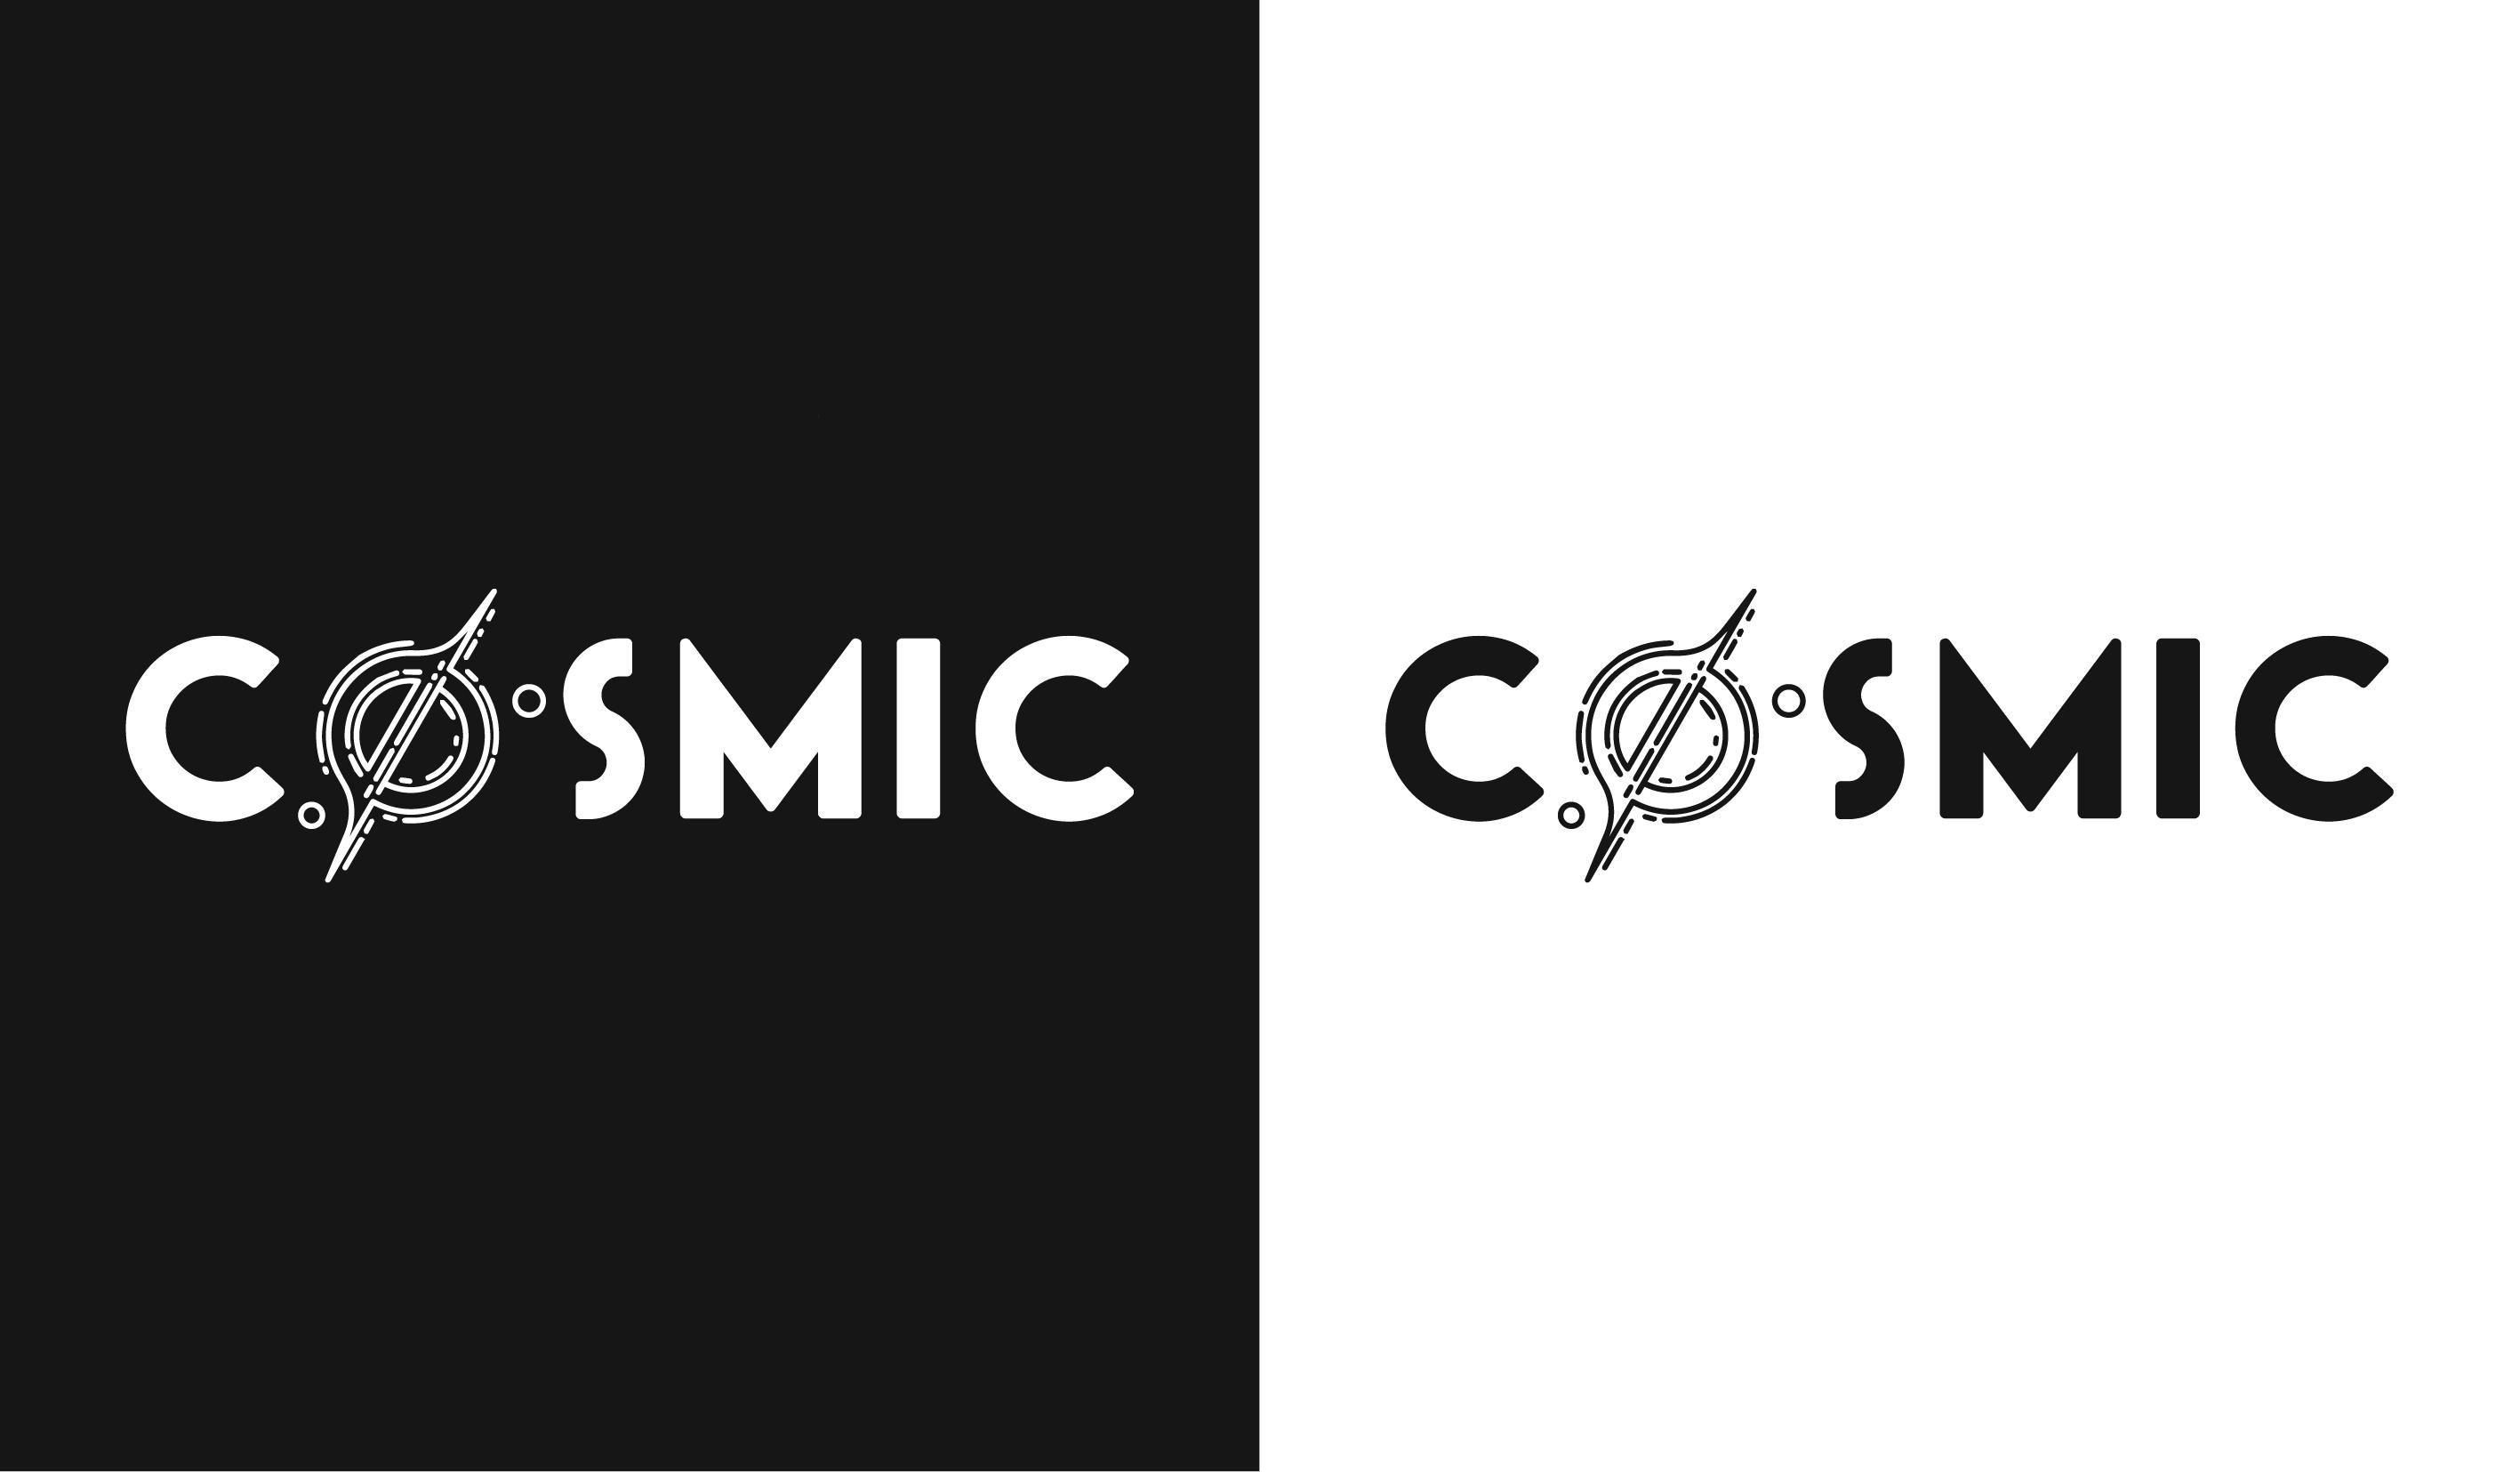 I will Design minimalist Custom logo